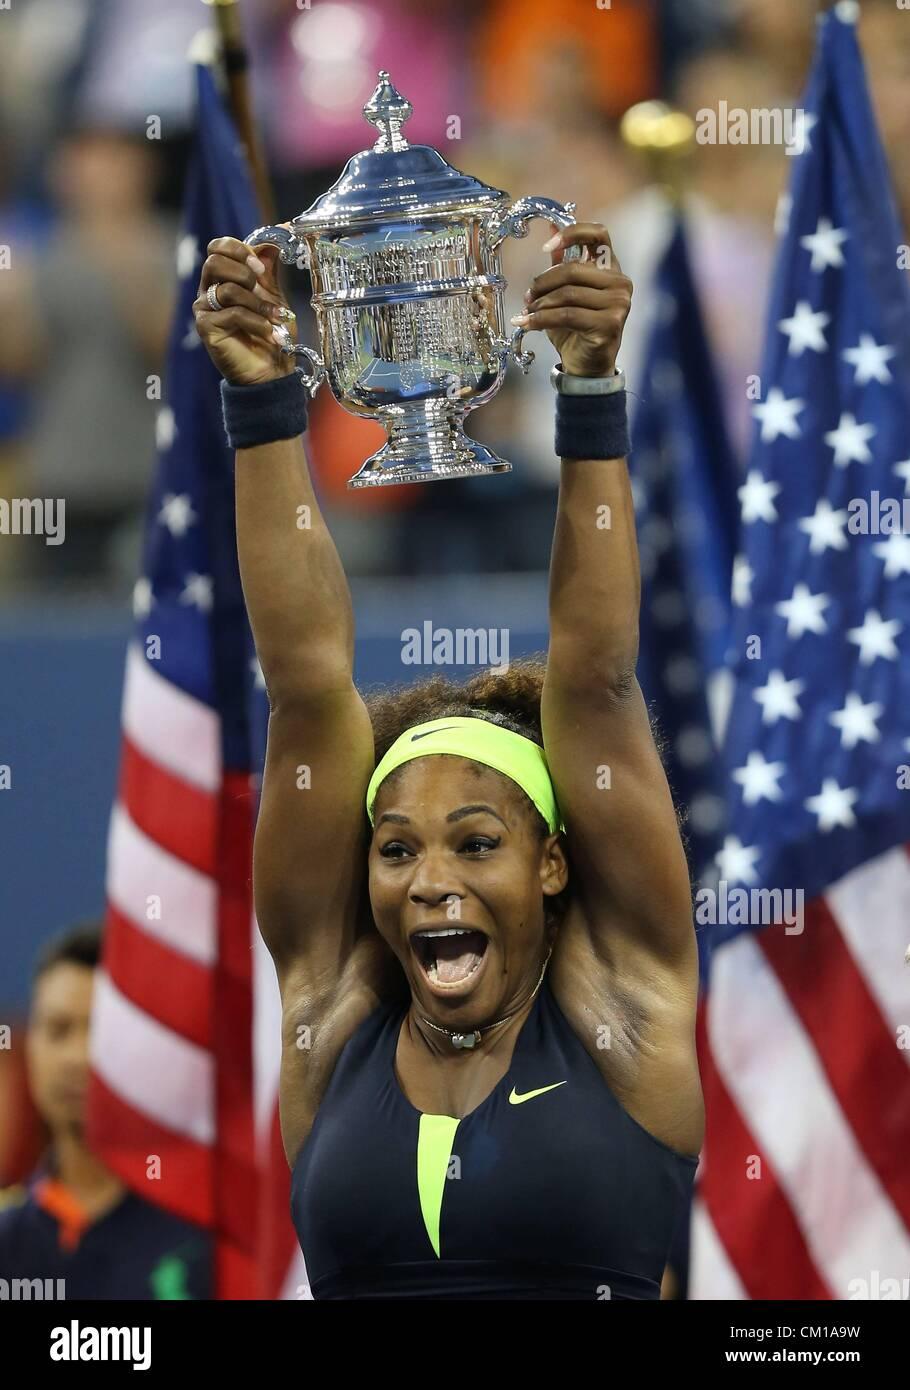 09.09.2012. Flushing, NYC, USA.   U.S. Open 2012 USTA Billie Jean King National Tennis Center Flushing Meadows New - Stock Image